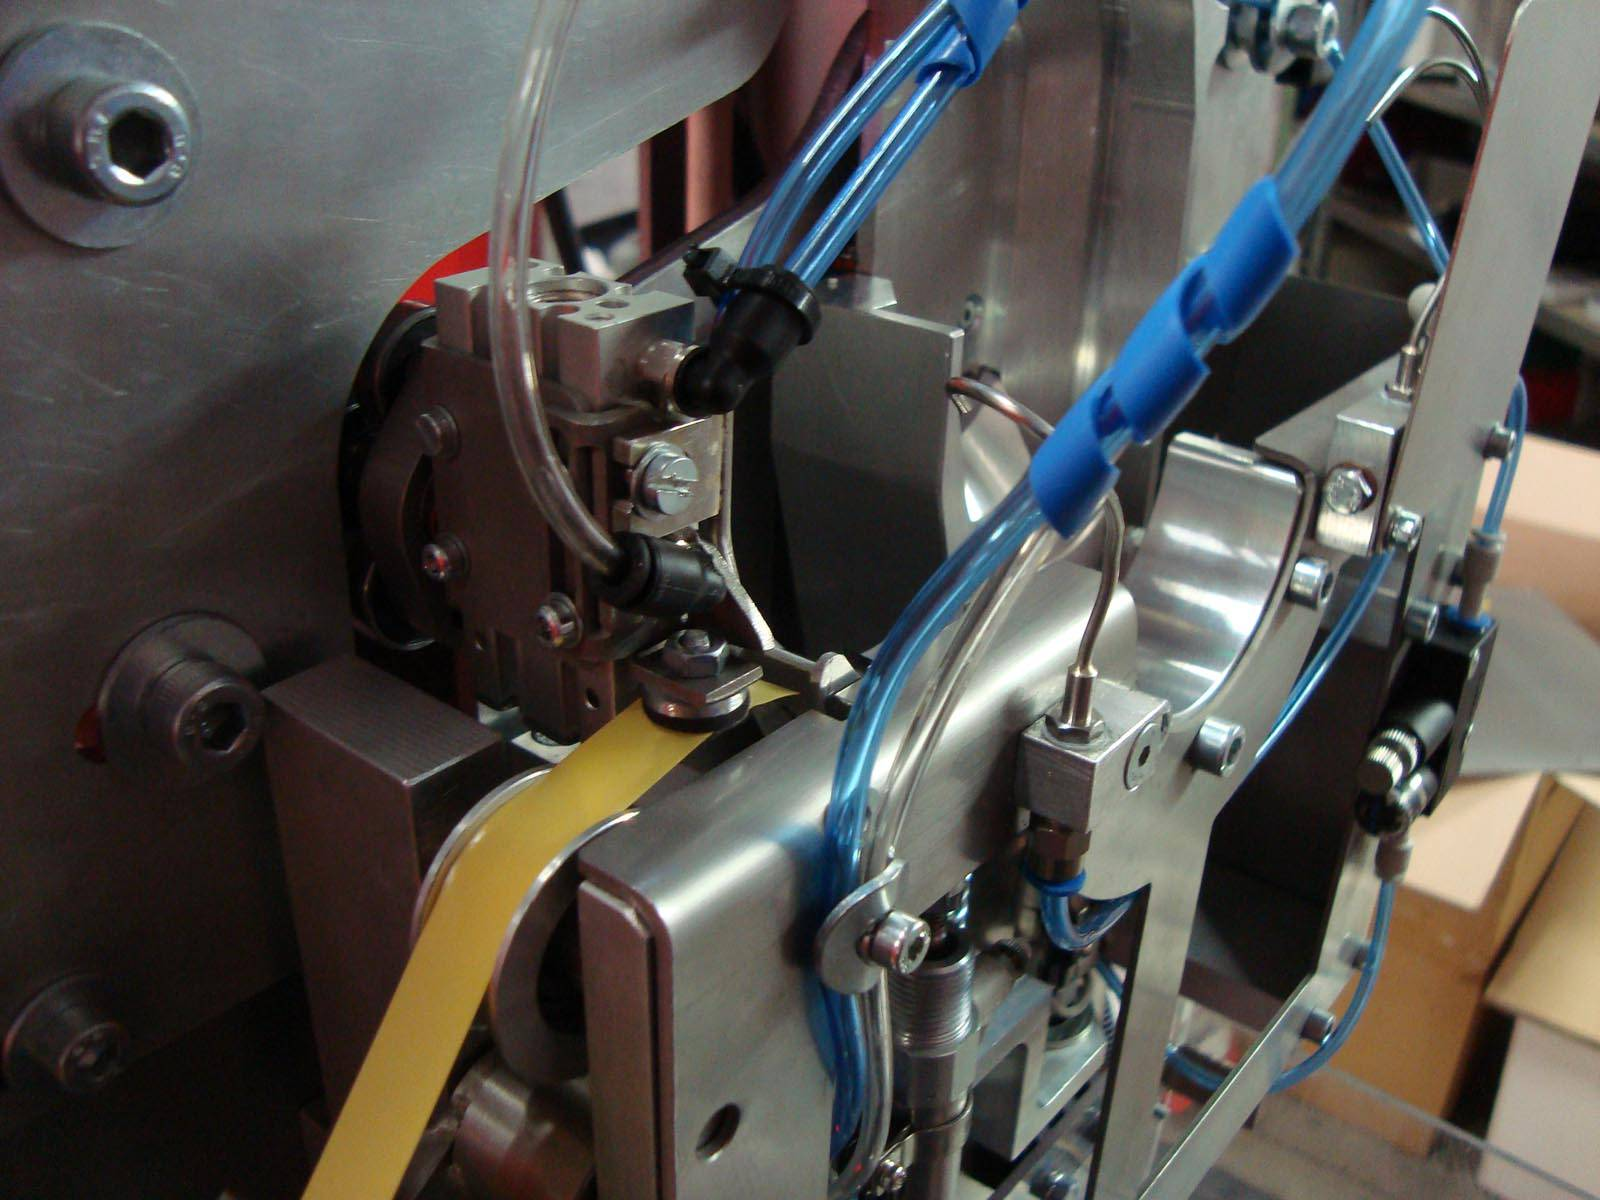 Machinebouw - tape dispenser   amtgroup.nl